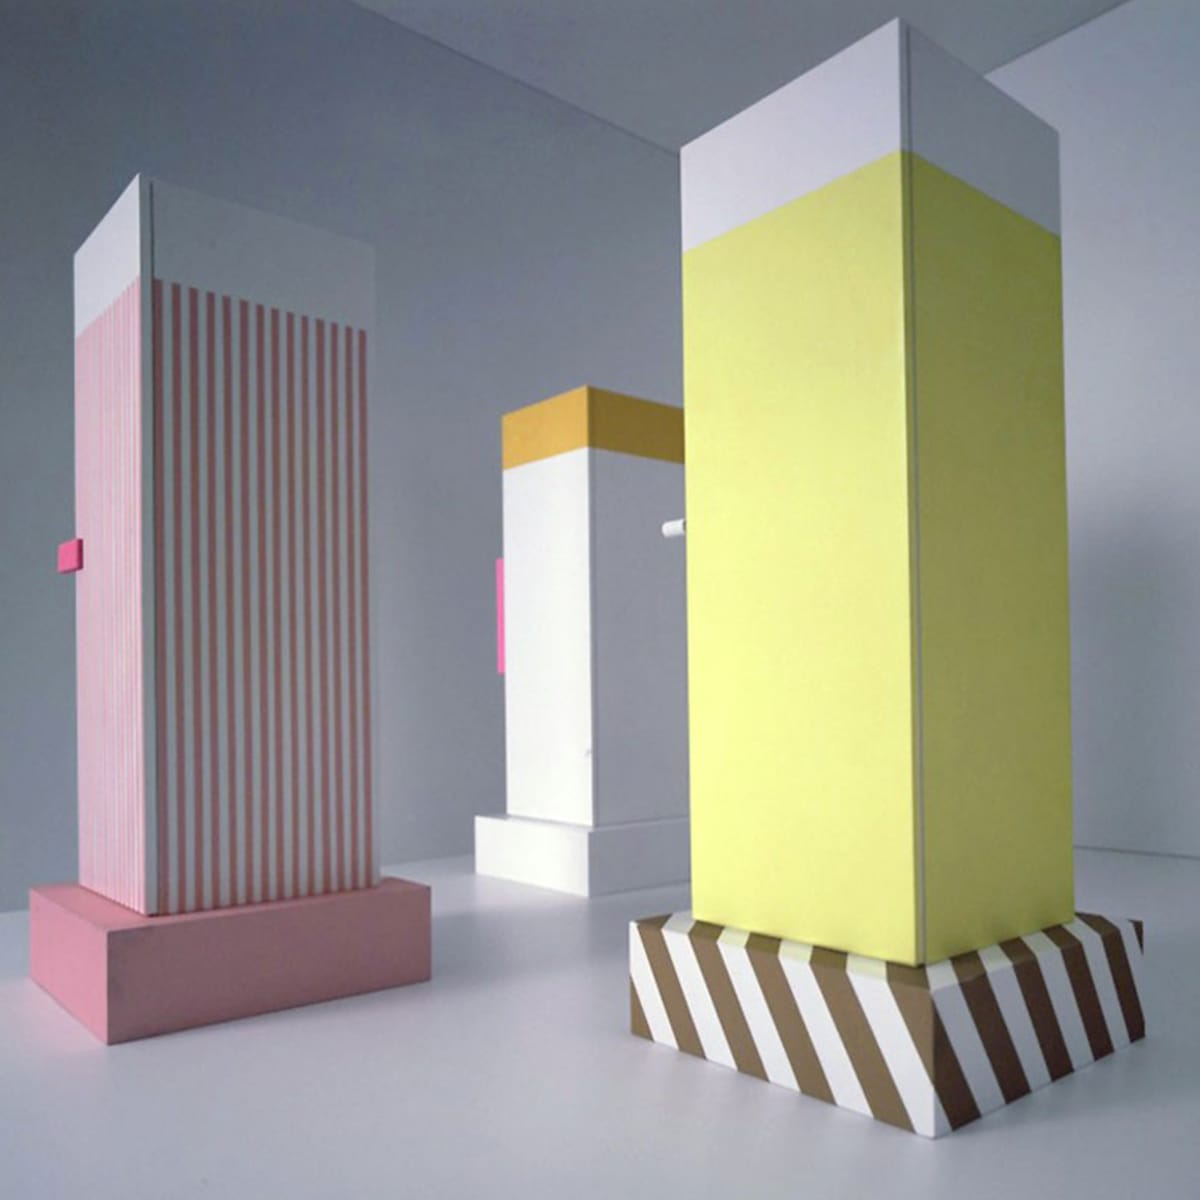 Sottsass' Superboxes, designed circa 1960 for Poltronova.